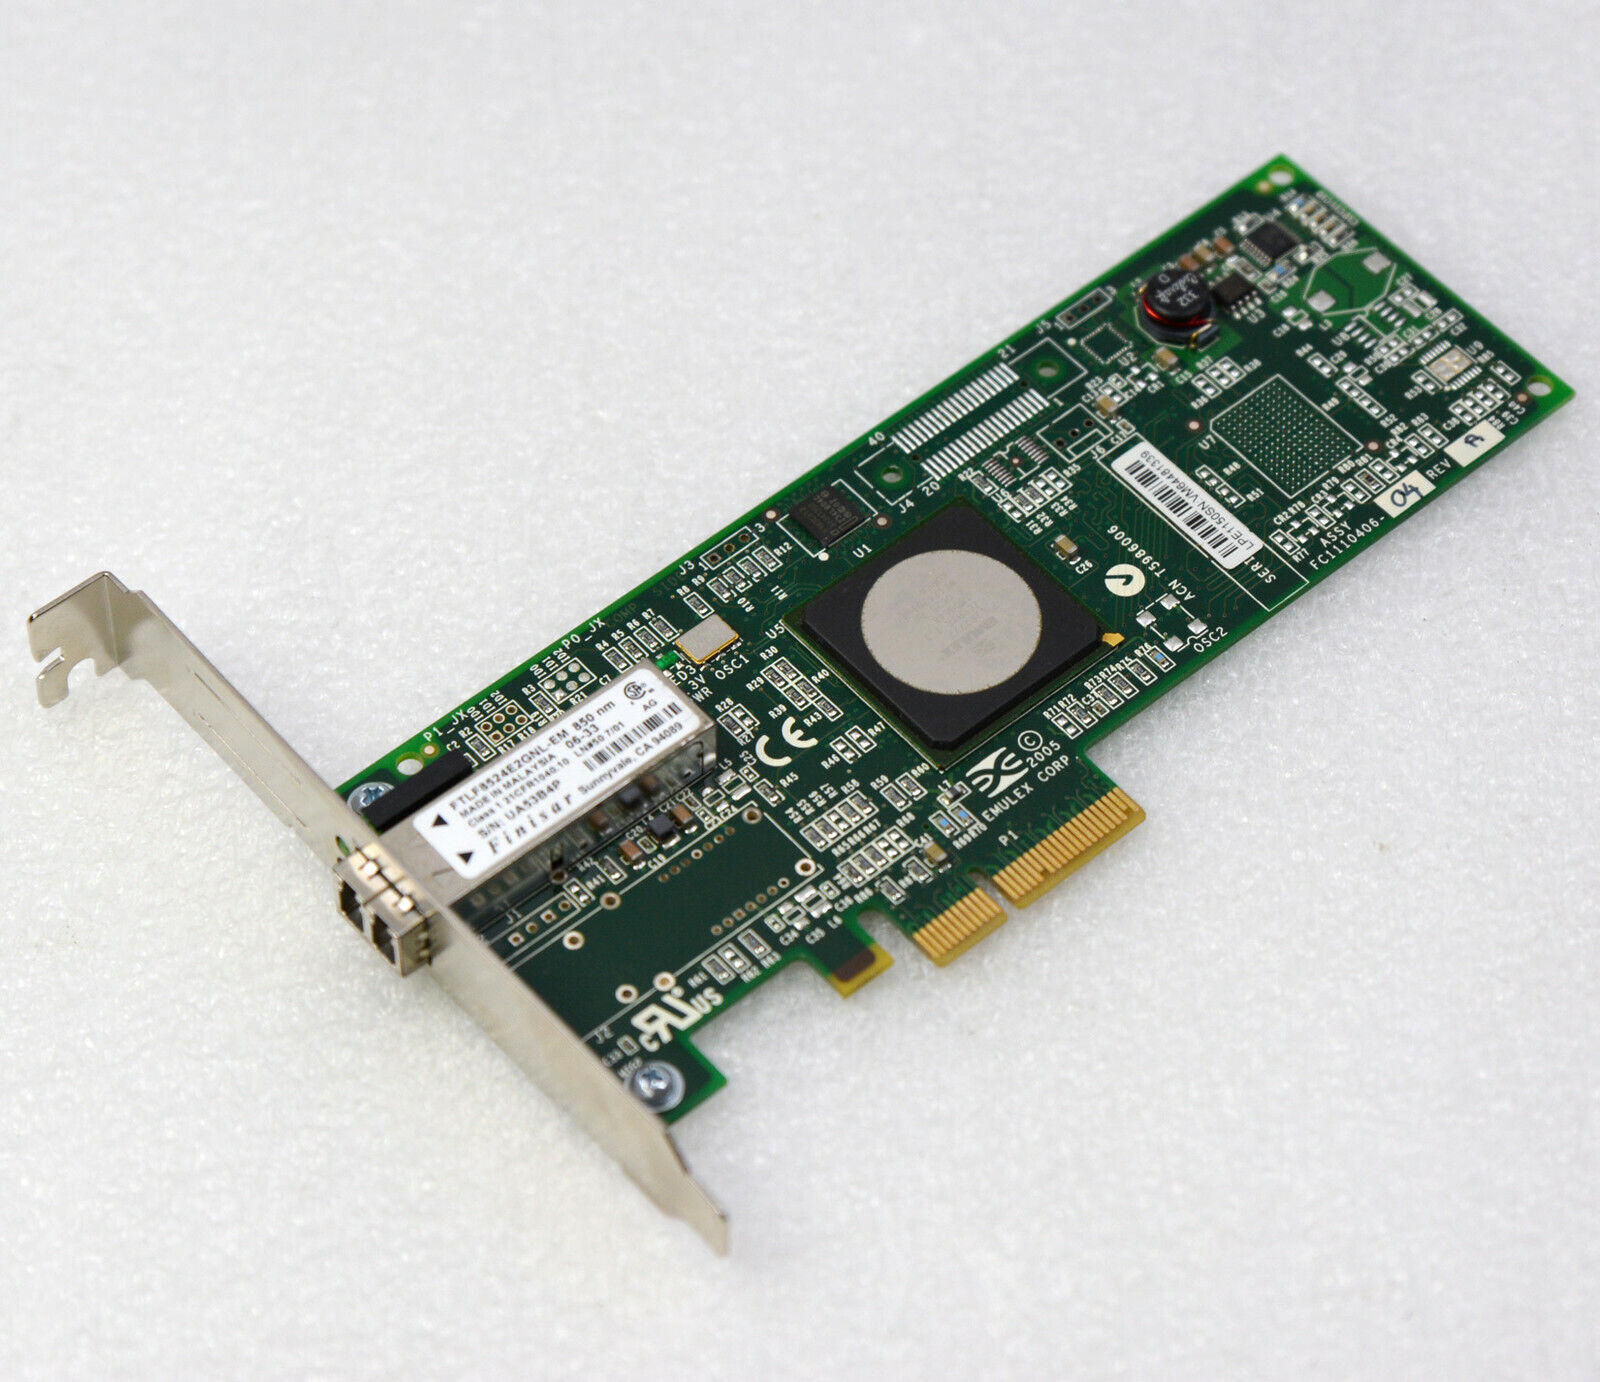 4GBit Network Card Fibre Channel Pci-E FC1120005-04A A8002-60001 Lancard #NW5 MM